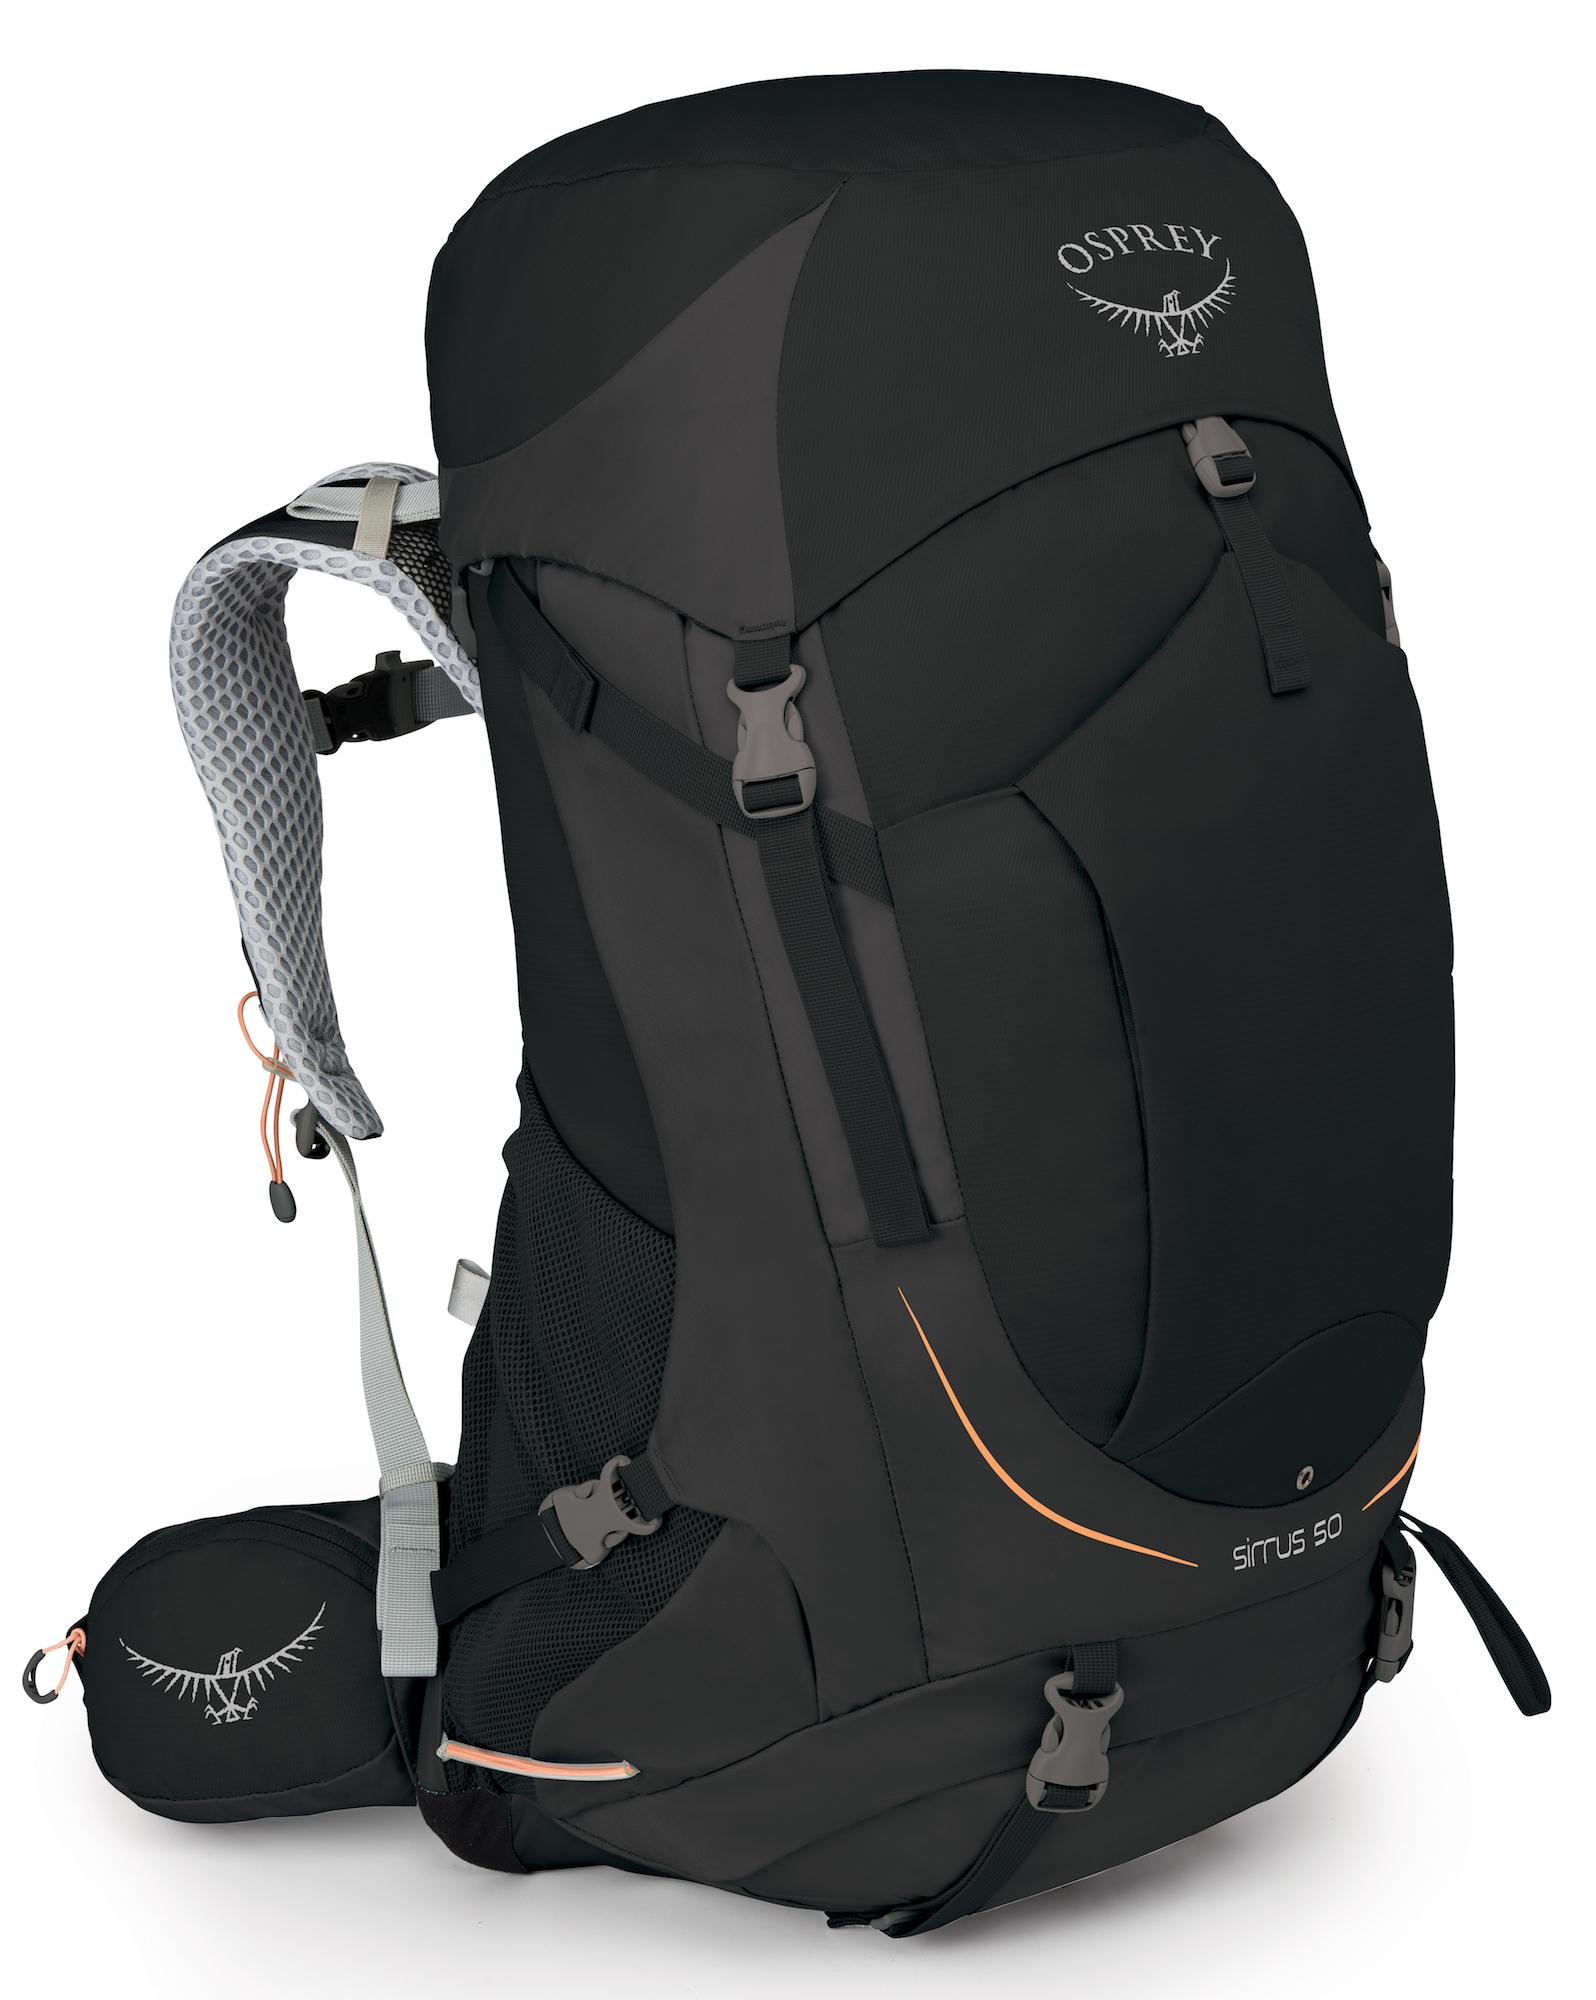 Osprey - Sirrus 50 - Backpack - Women's